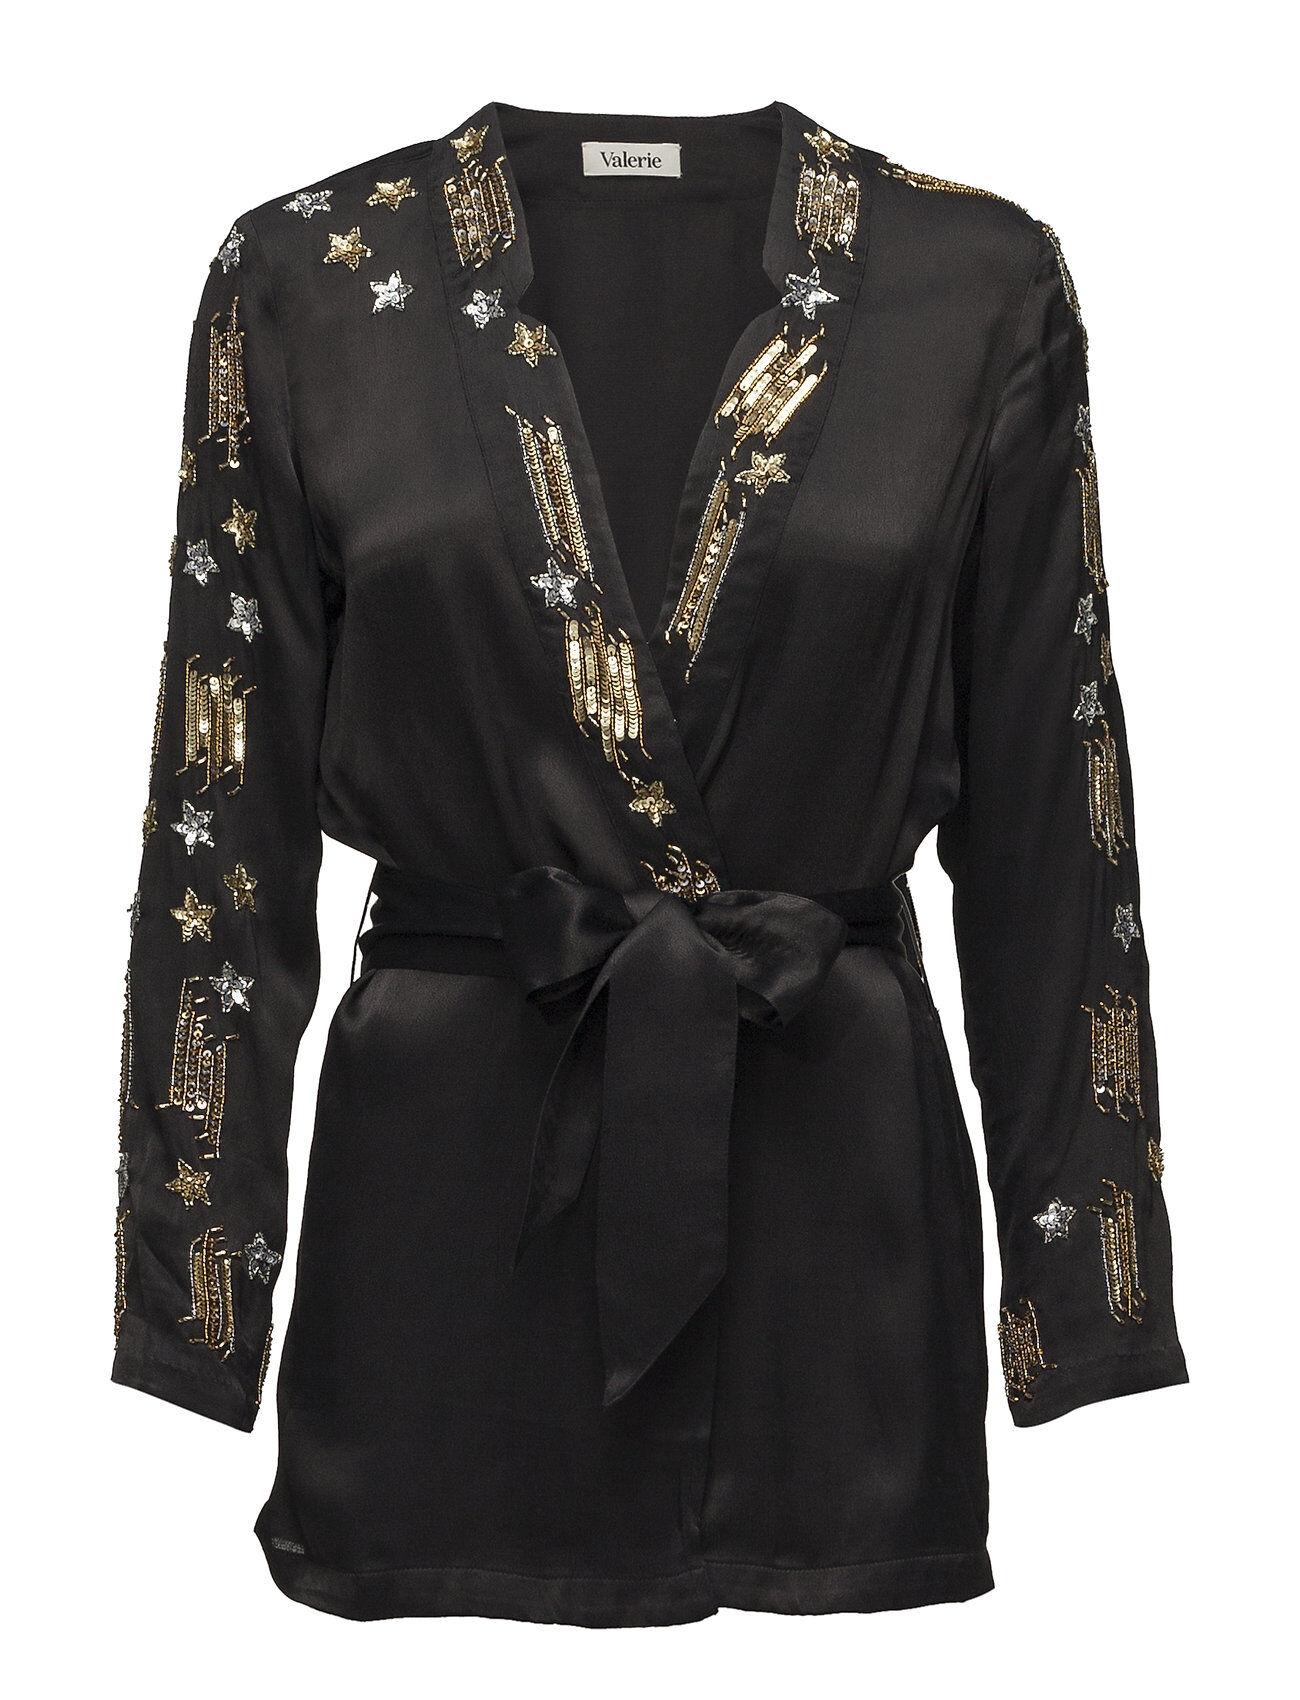 Valerie Vegas Jacket